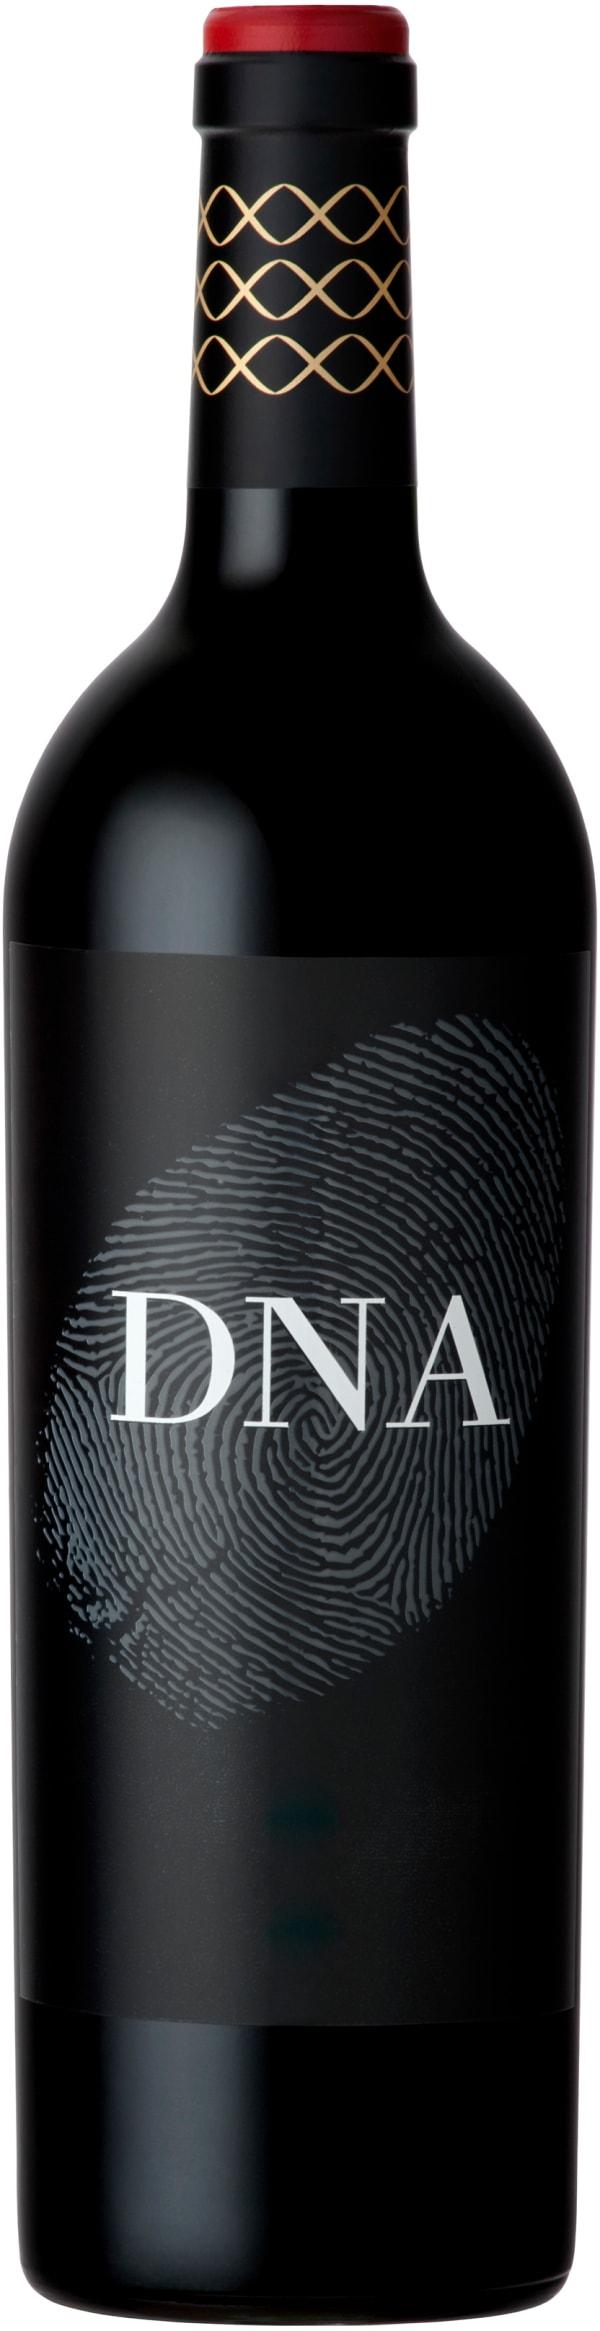 Vergelegen DNA 2015